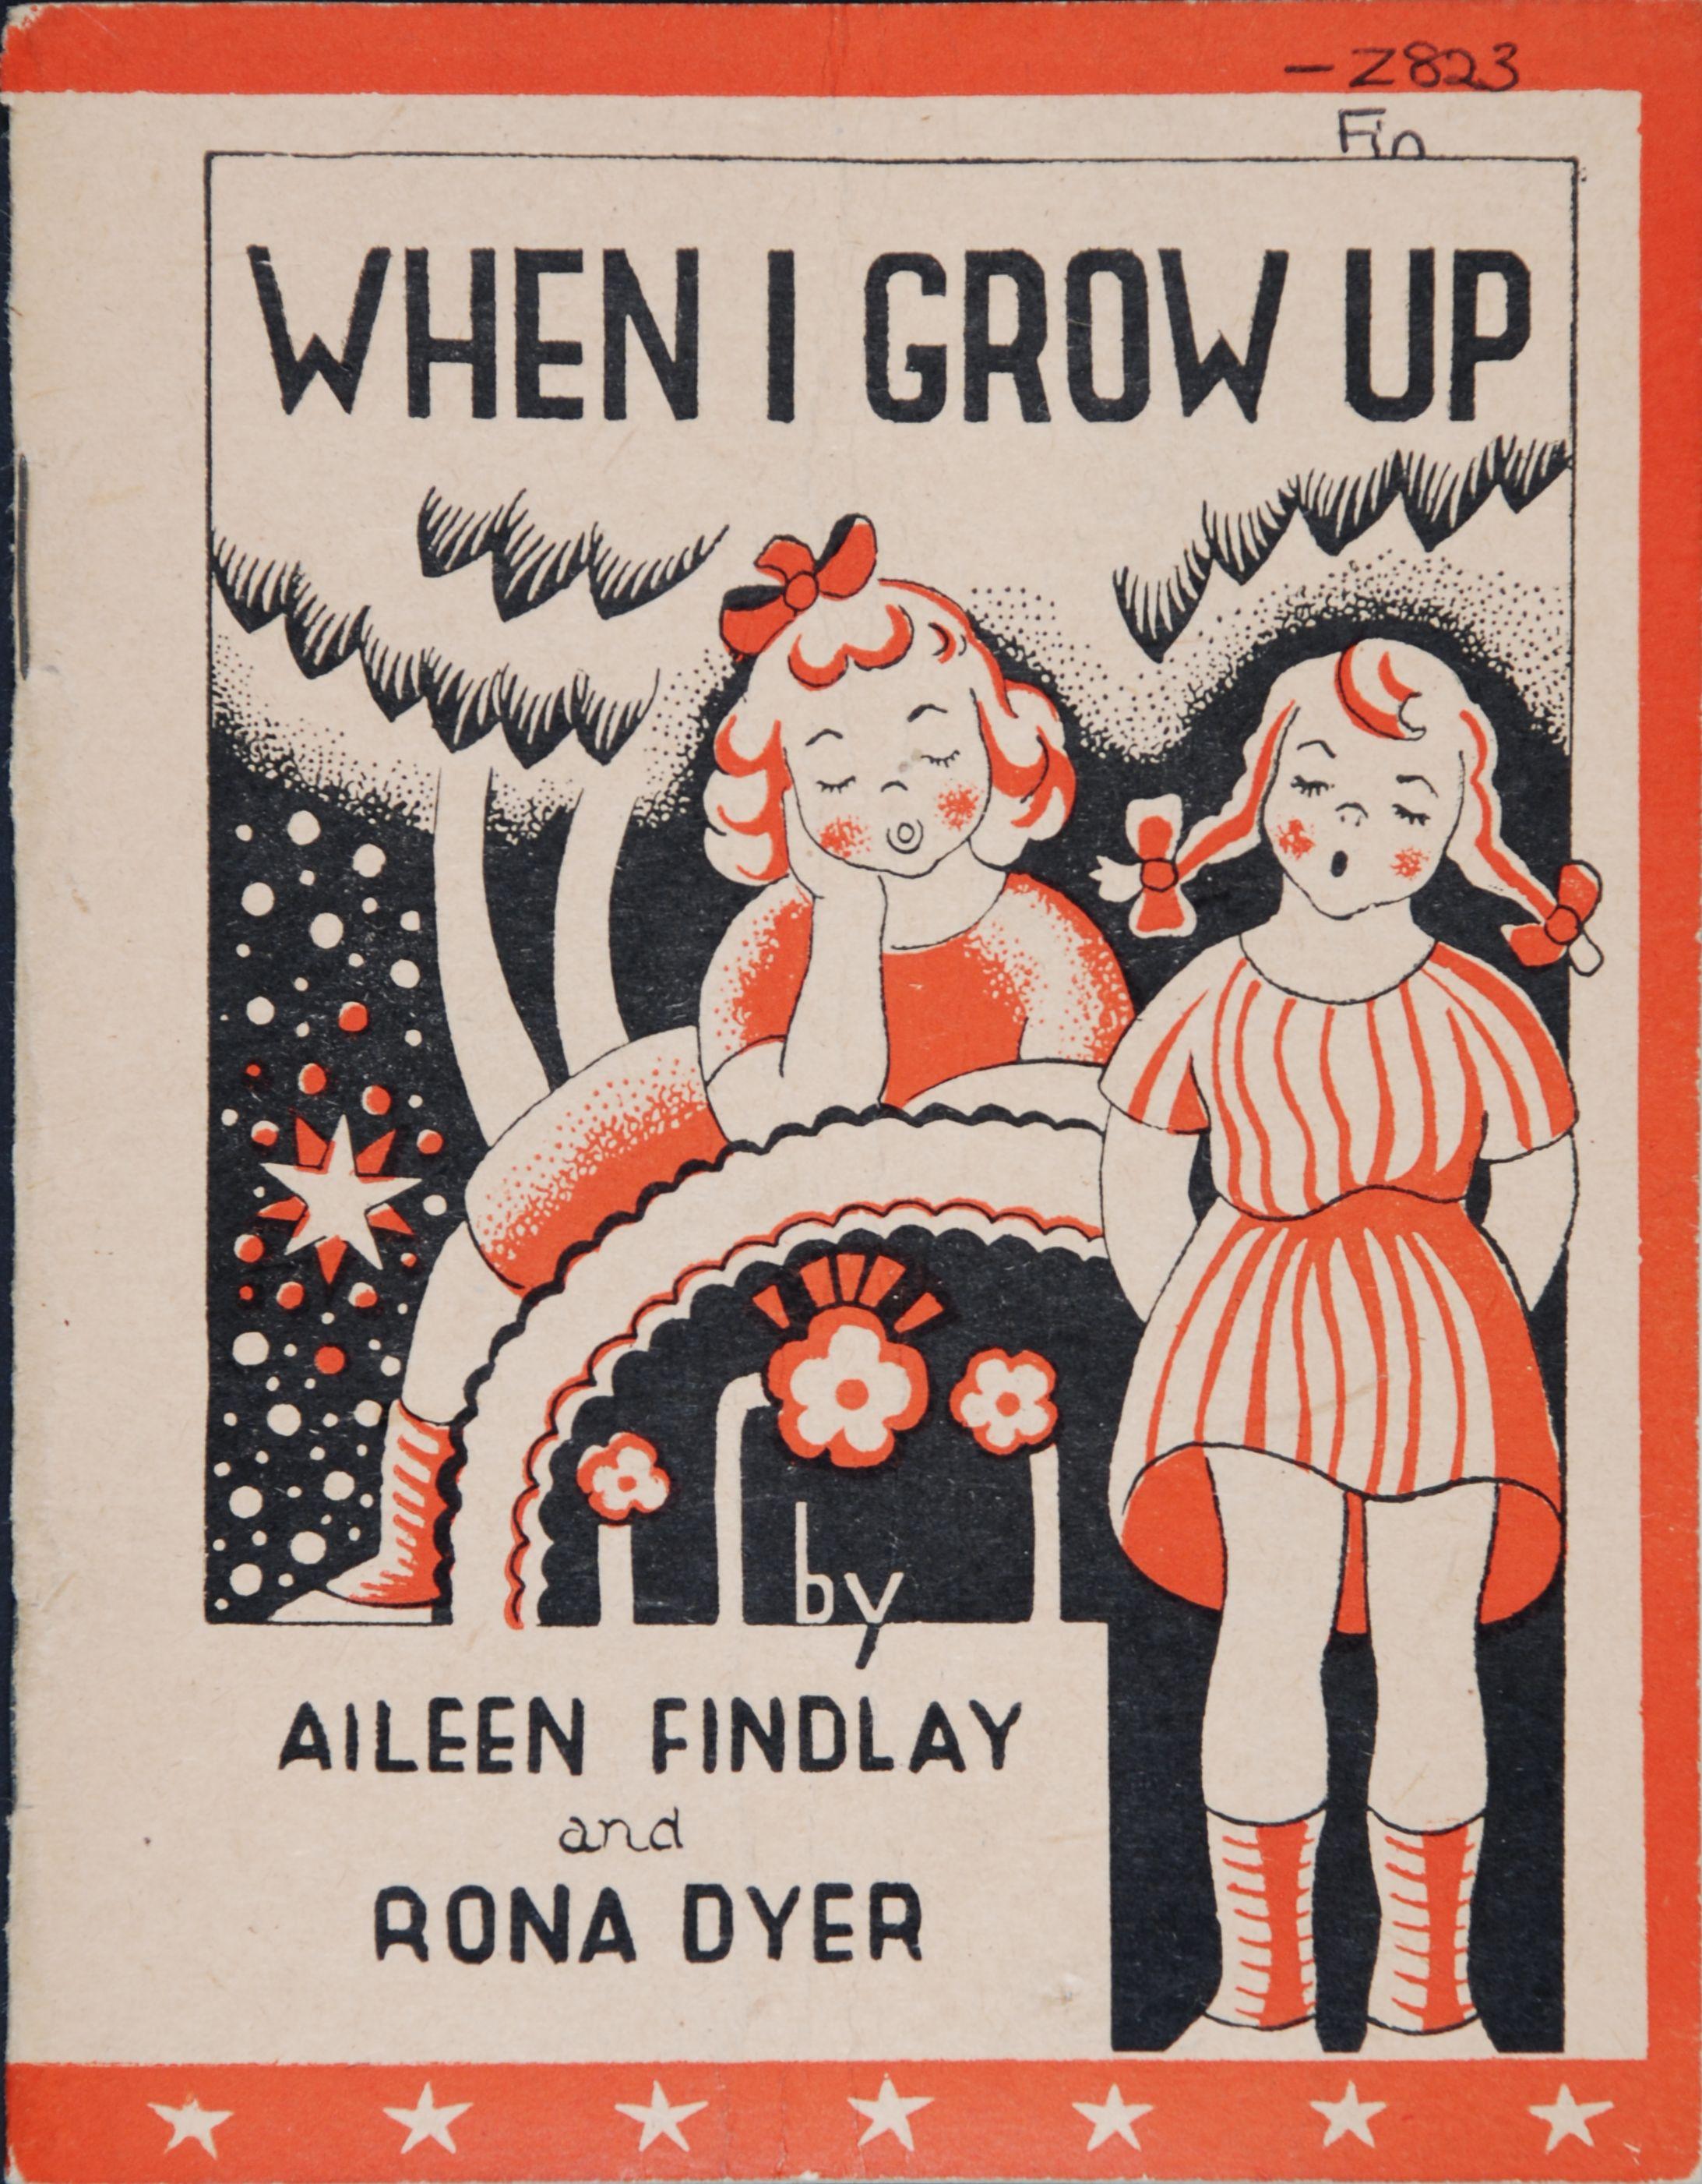 Aileen Findlay. When I grow up: a read it your-self book. [Wellington, N.Z.: Progressive Publishing Society], 1944.